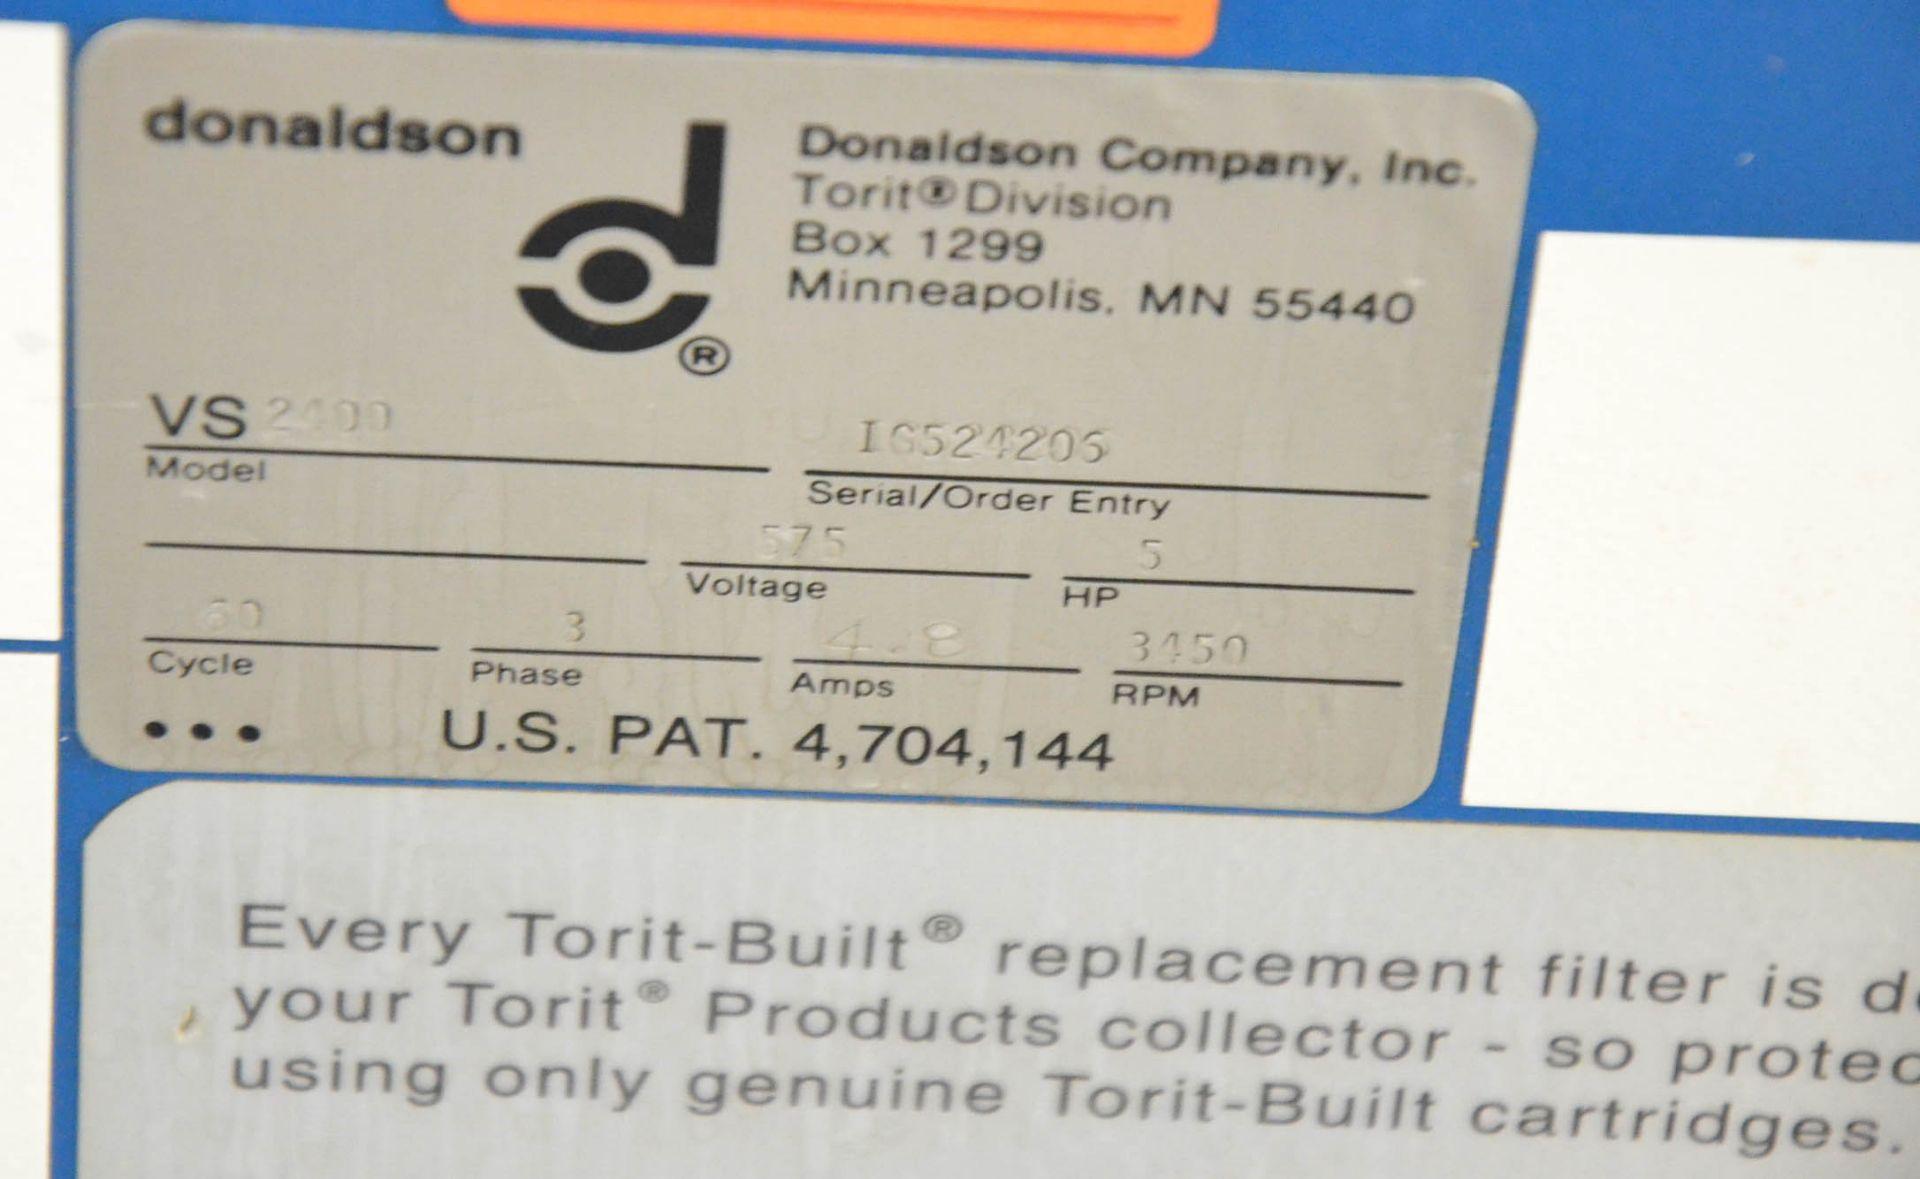 DONALDSON TORIT VS2400 5HP FLOOR-TYPE DUST COLLECTOR, 575V/3PH/60HZ, S/N: IG524206 (CI) [RIGGING - Image 3 of 3